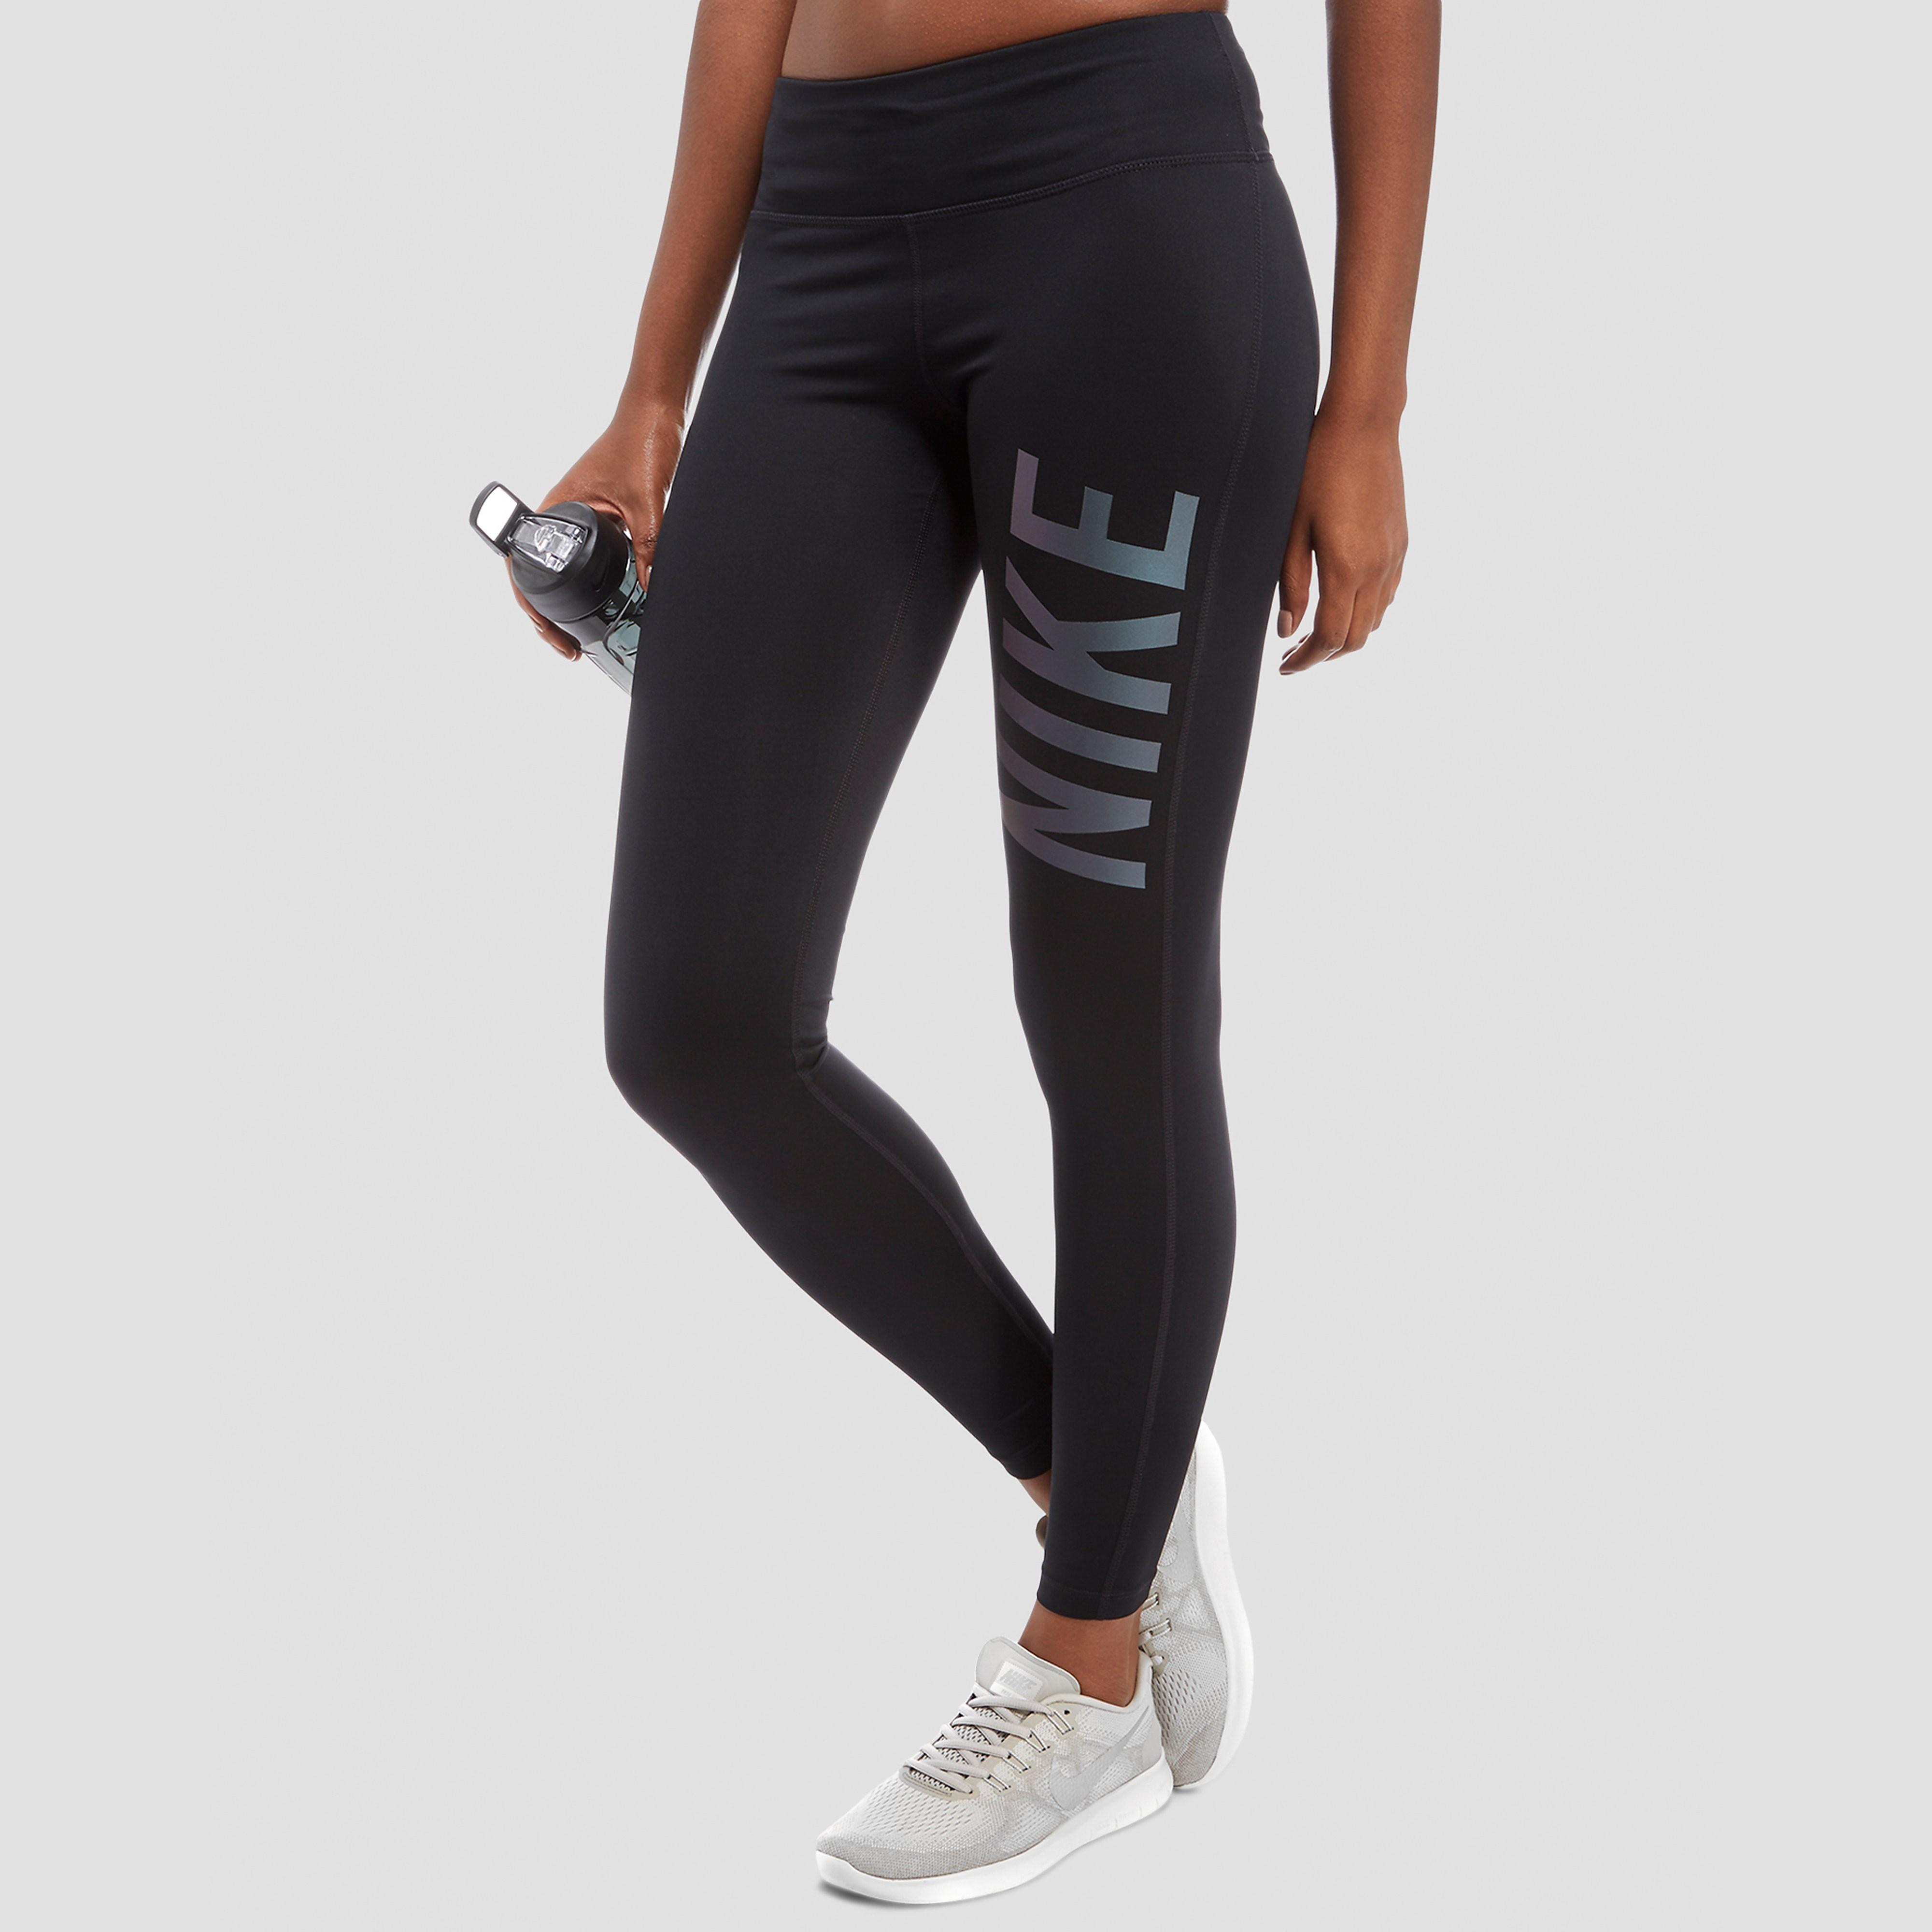 Nike Power Metallic Women's Running Tights